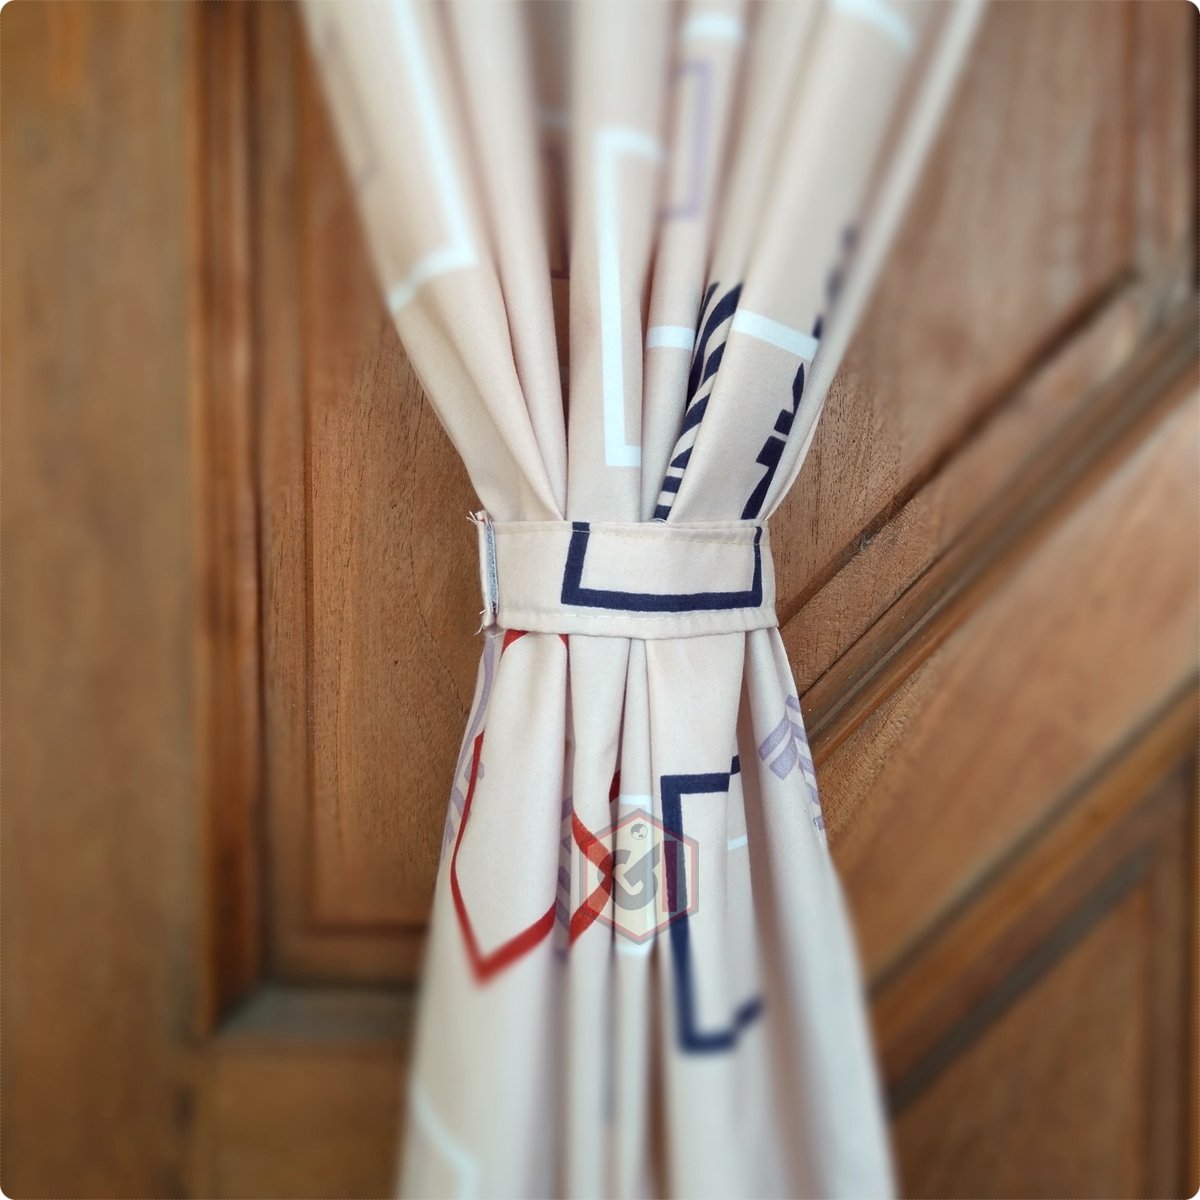 Gorden Pintu Rumah Motif Line Elegan Model Smokring 12 Ring Ukuran Panjang Murah